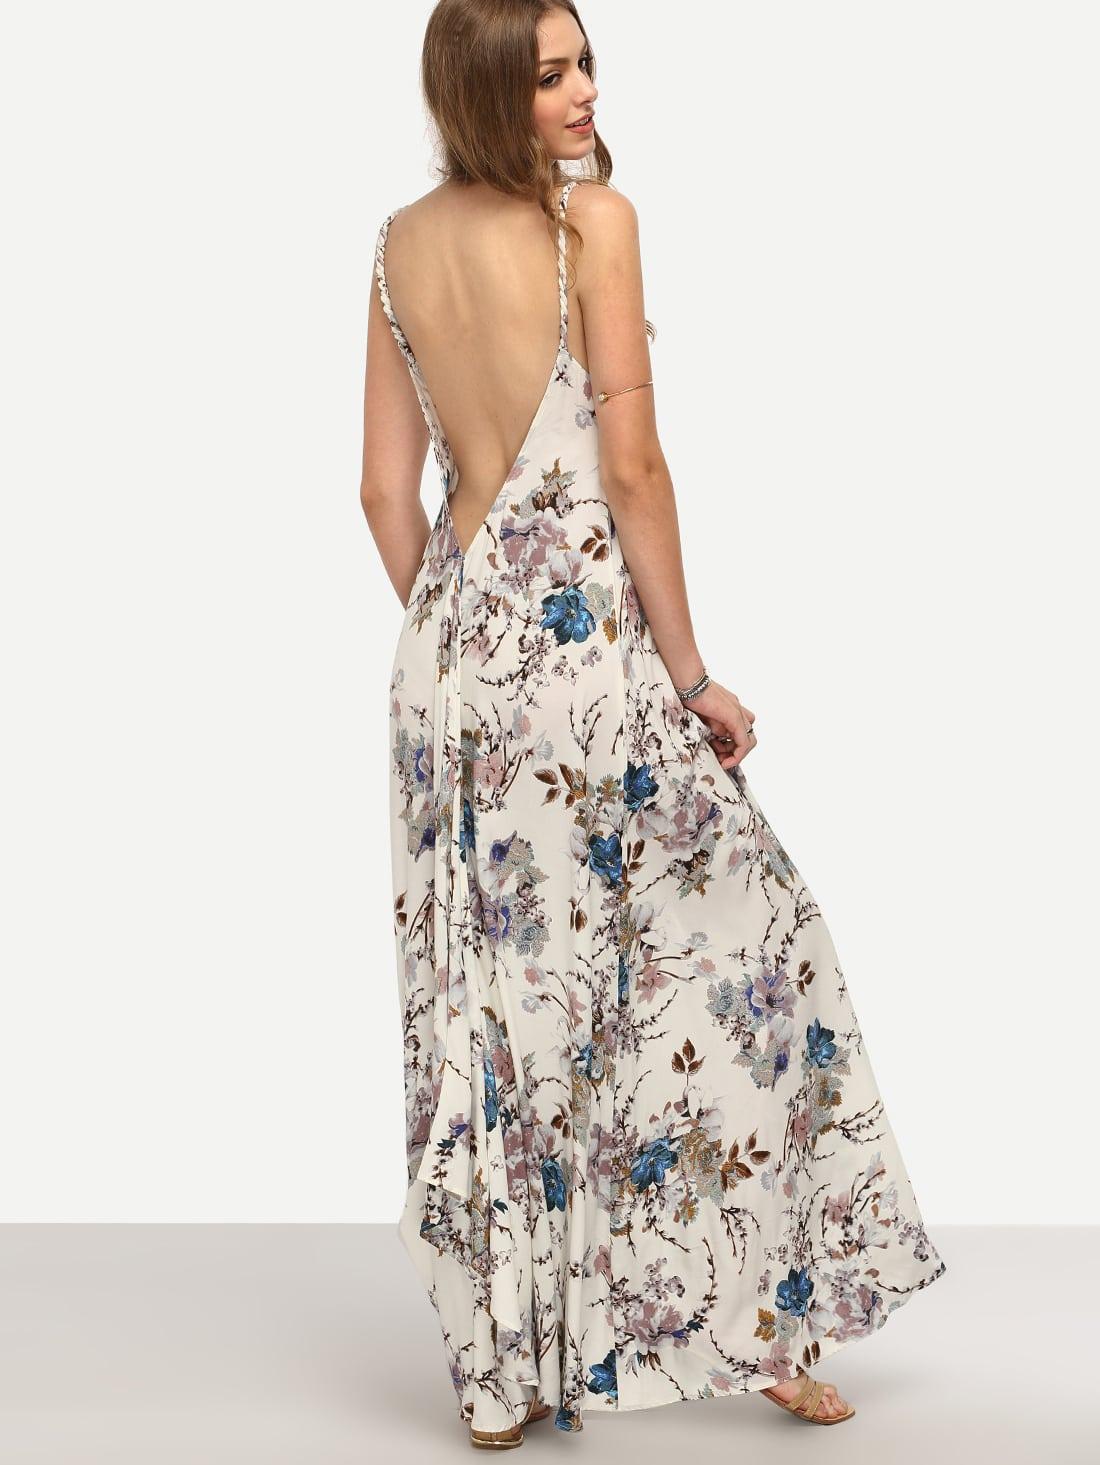 robe longue bretelle motif fleuri col v dos nu multicolore french romwe. Black Bedroom Furniture Sets. Home Design Ideas